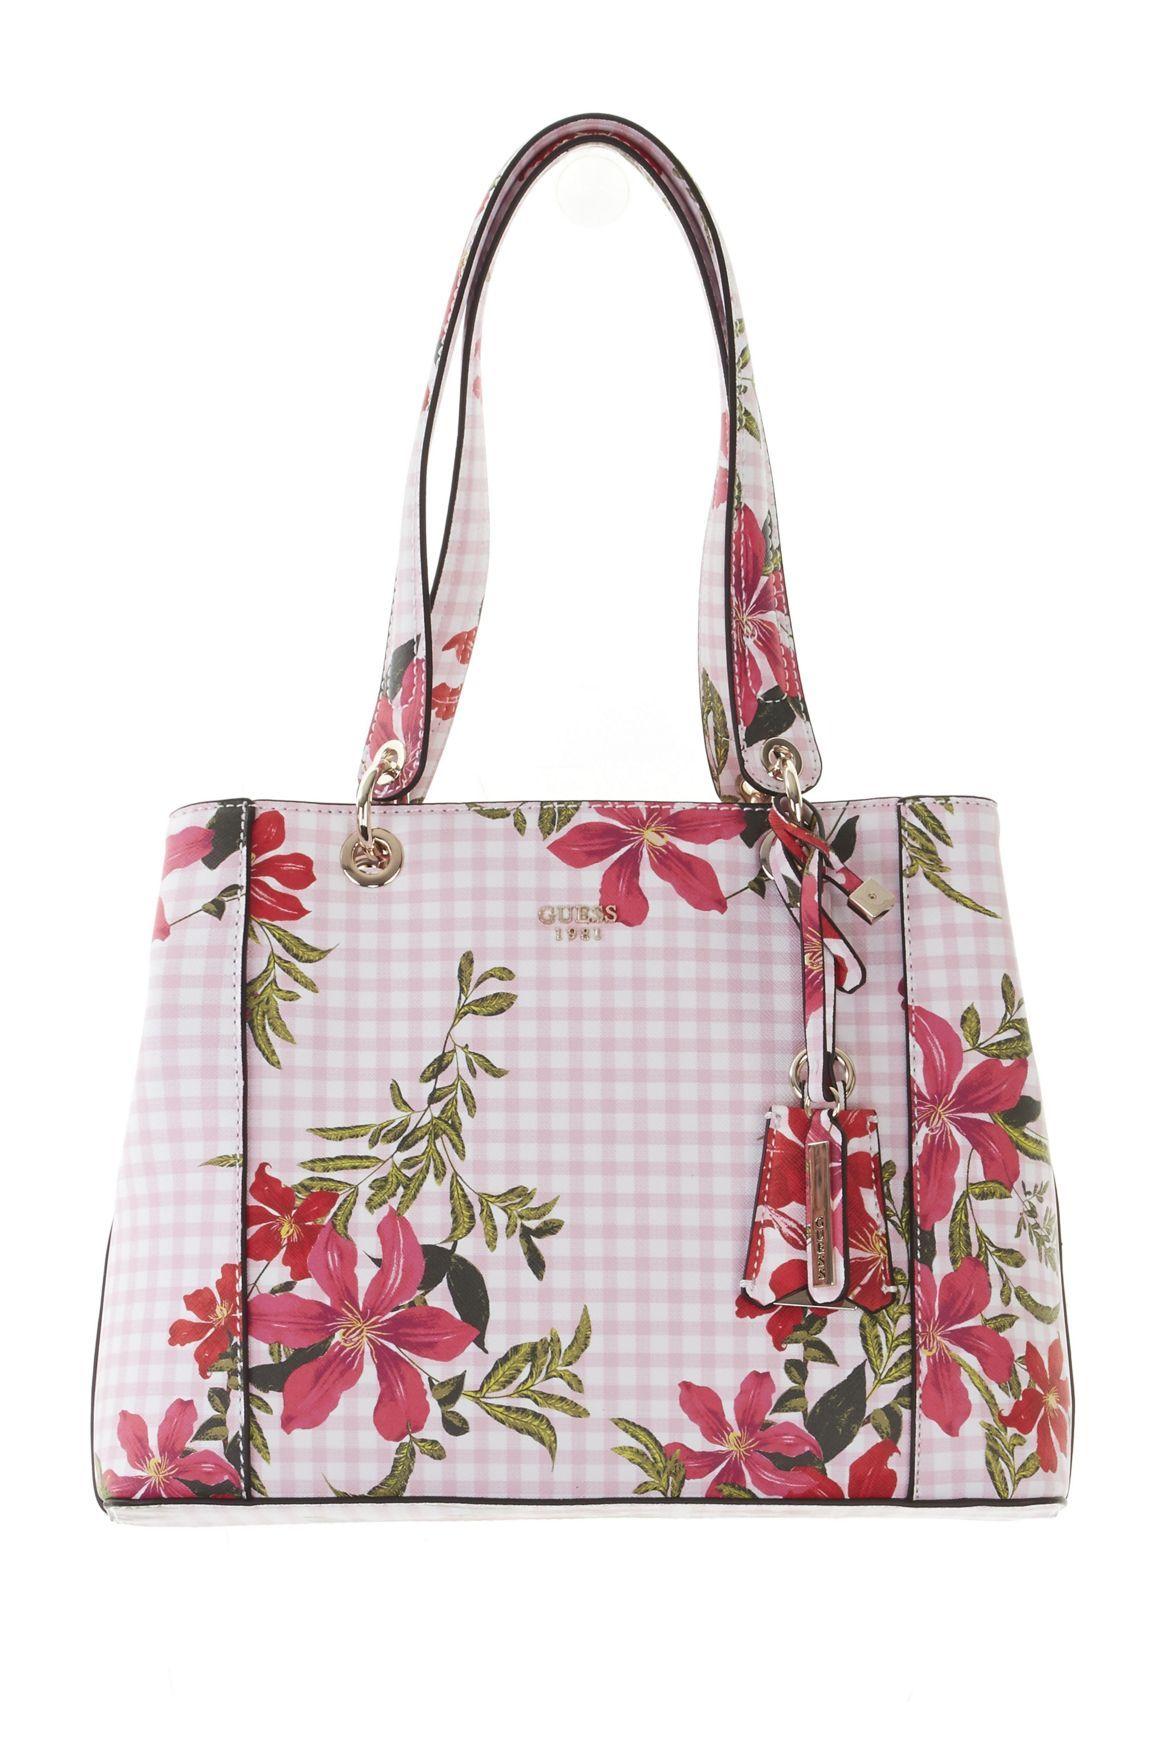 Guess Kamryn Shopper 3172513 Handbags | Strandbags